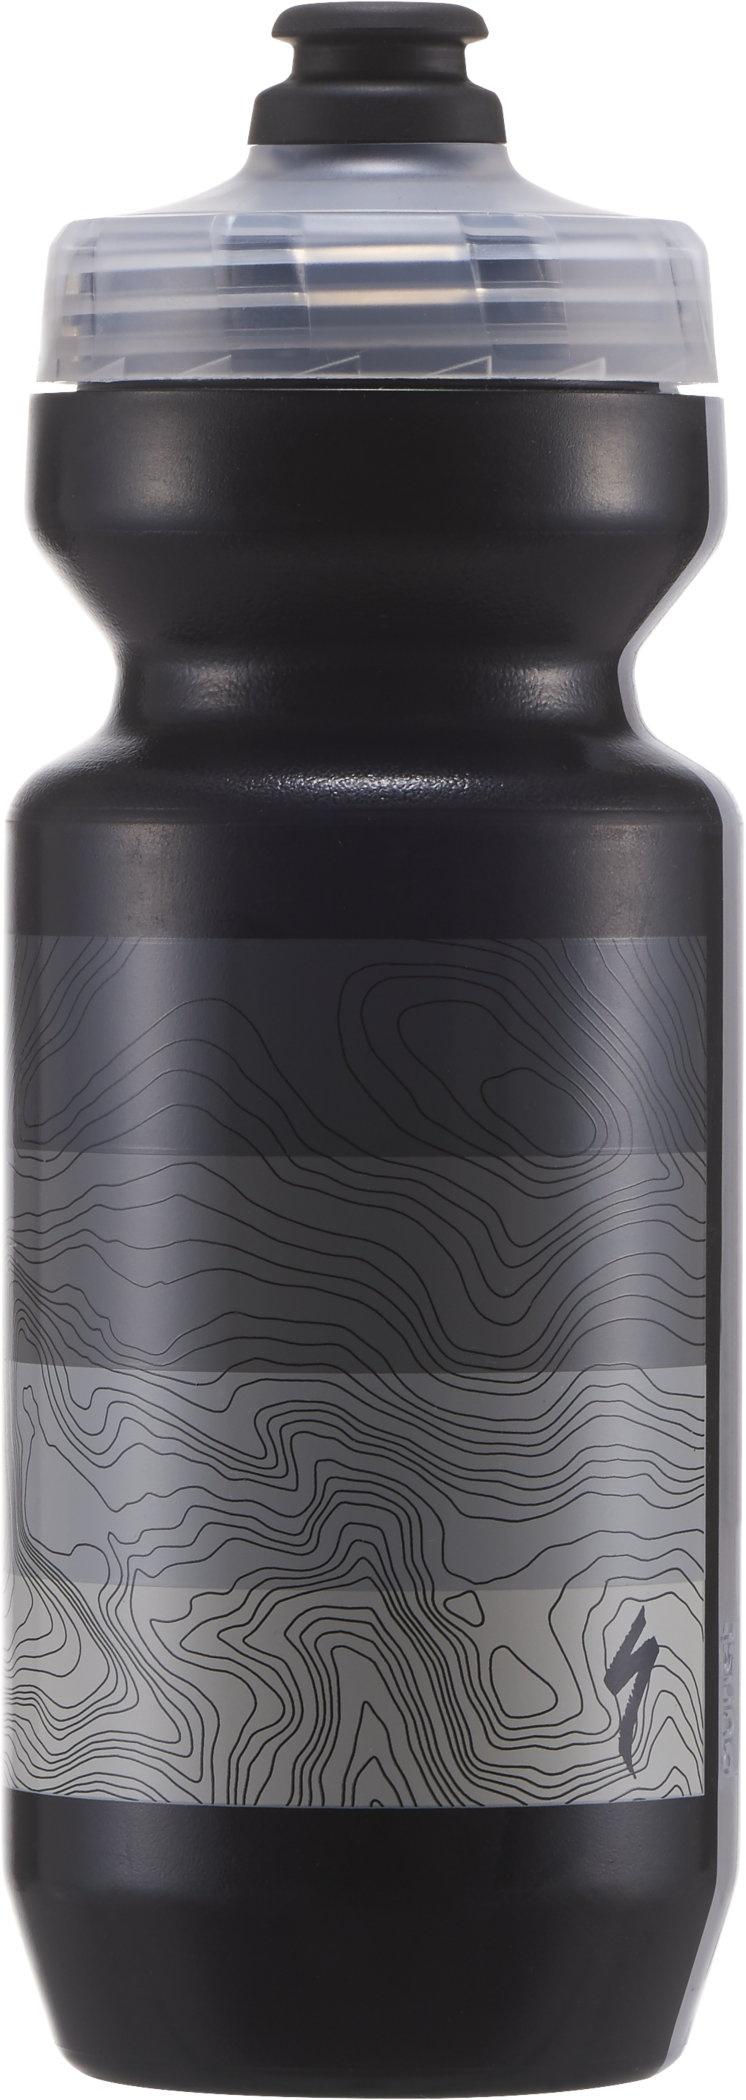 Køb Specialized Purist MoFlo 650ml drikkedunk – Stripe Black